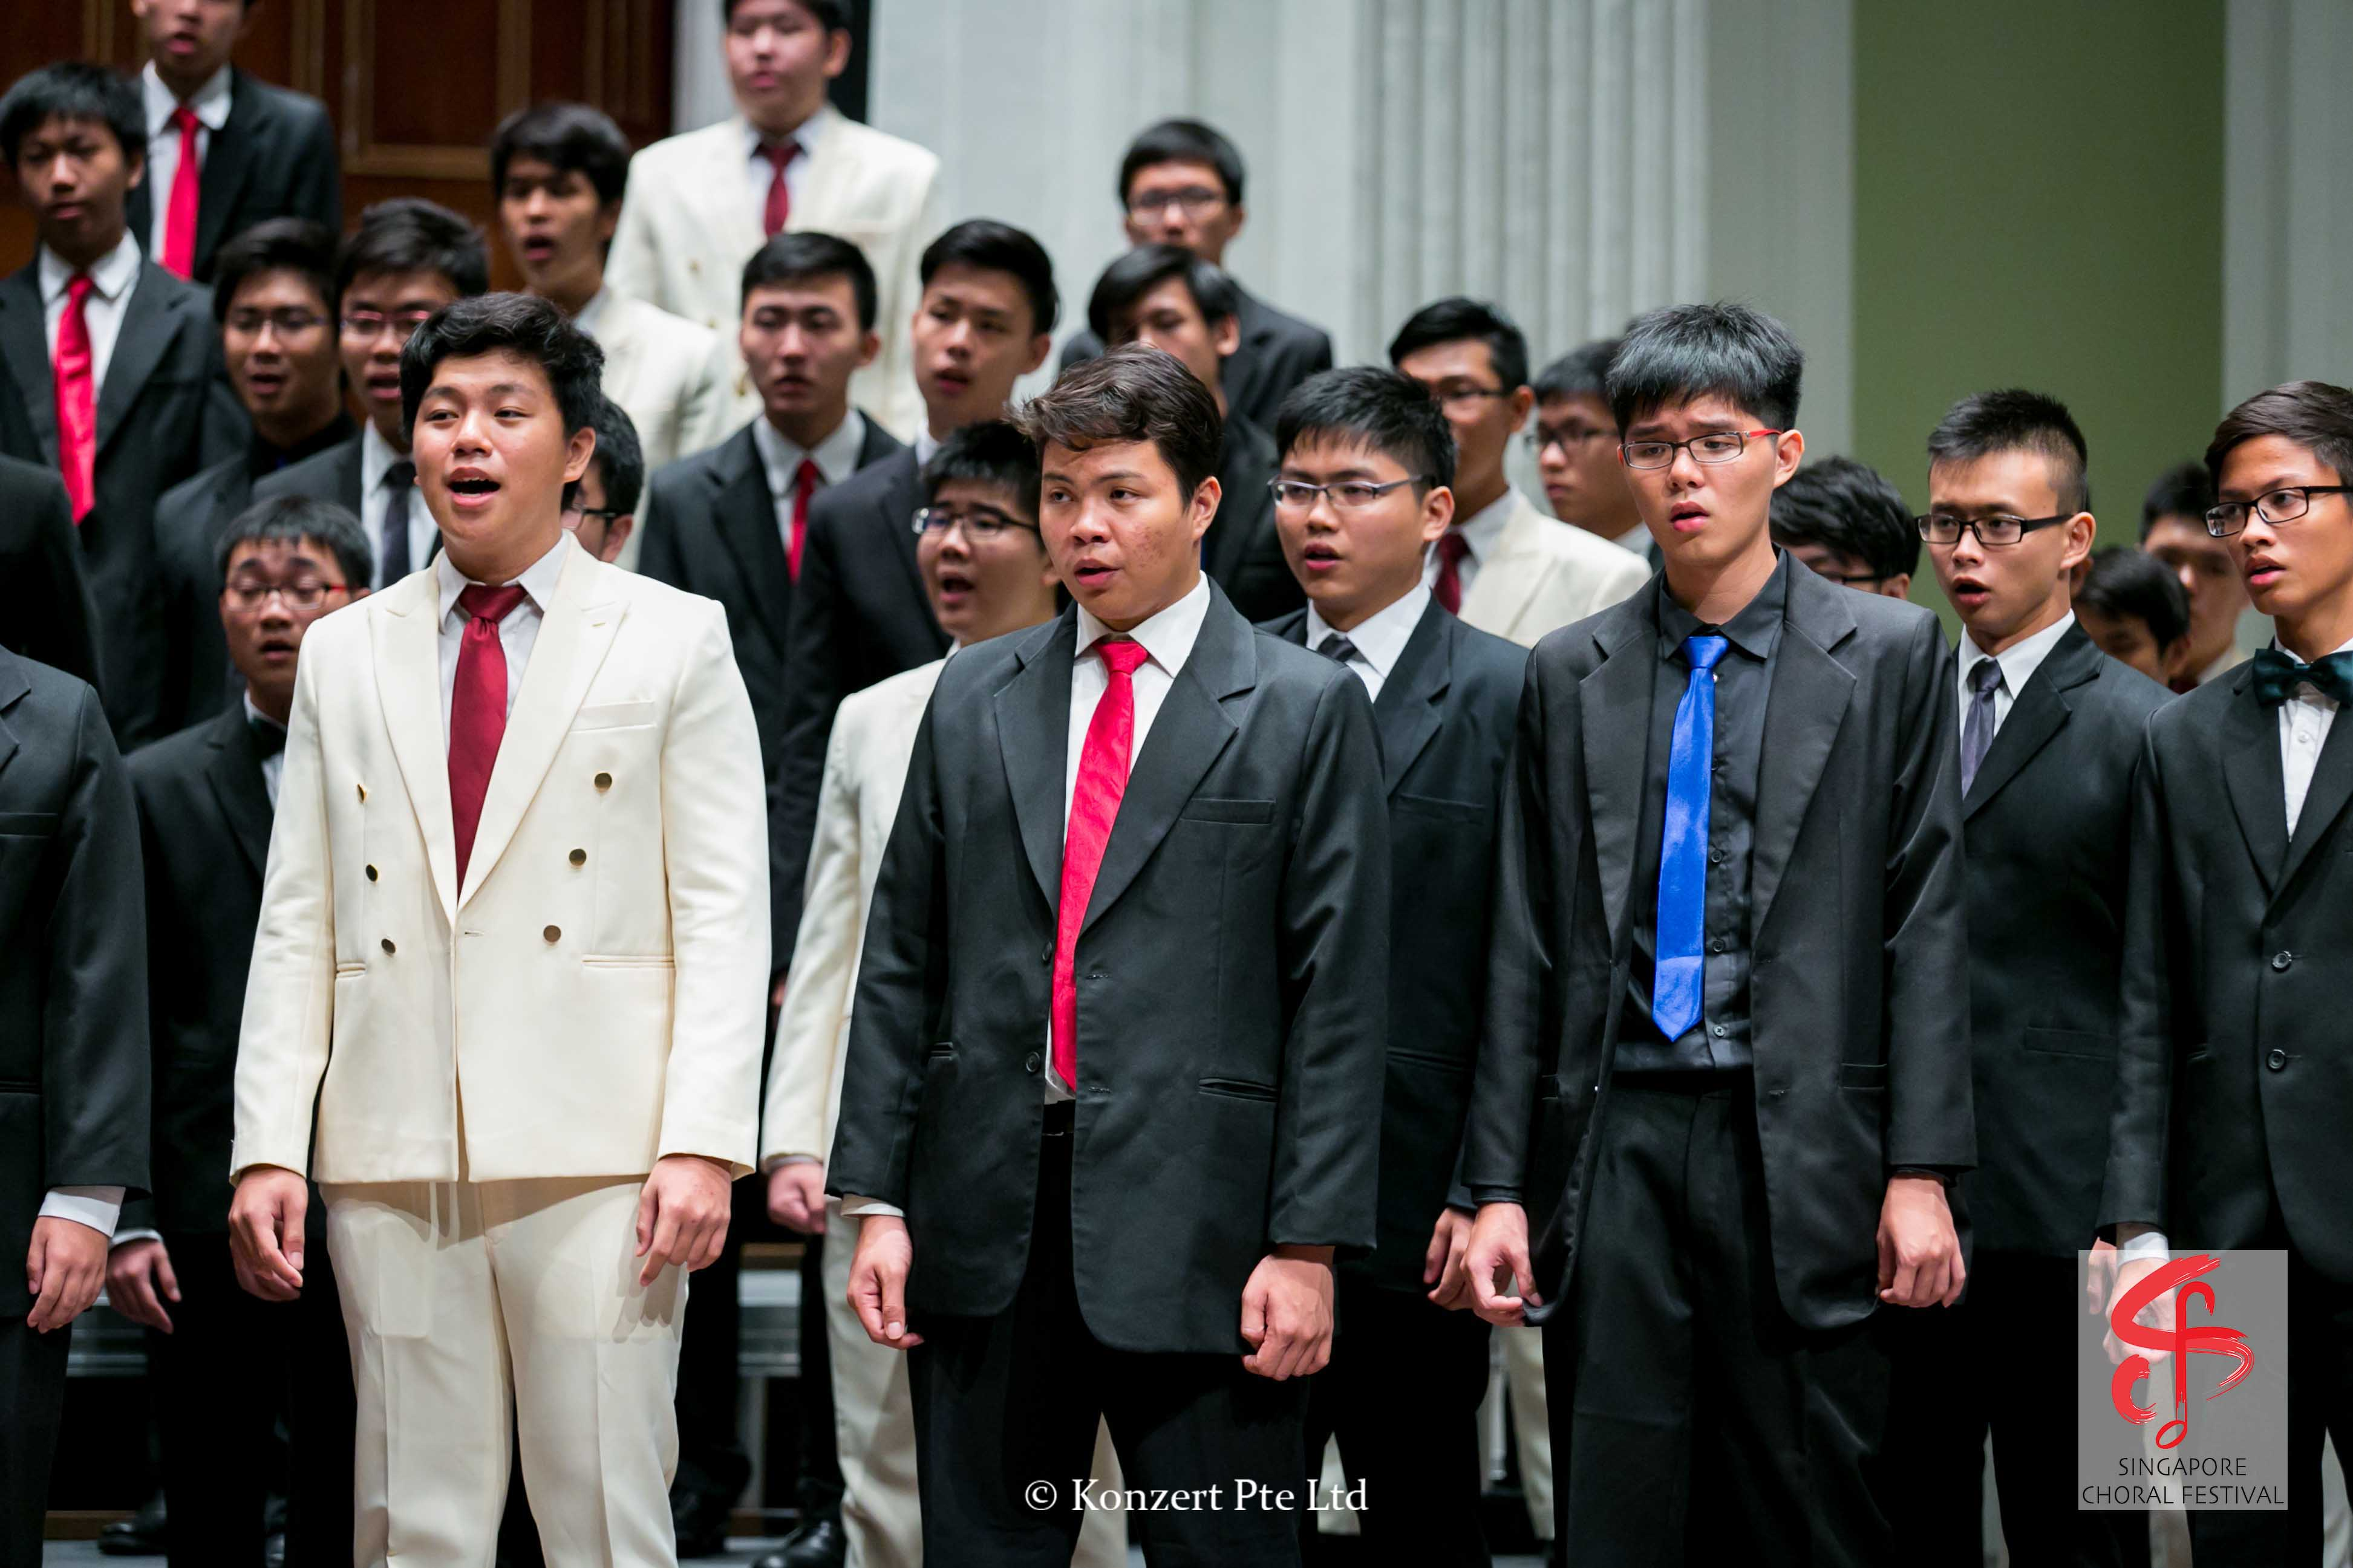 Singapore Choral Festival 7-8-15 (173).jpg